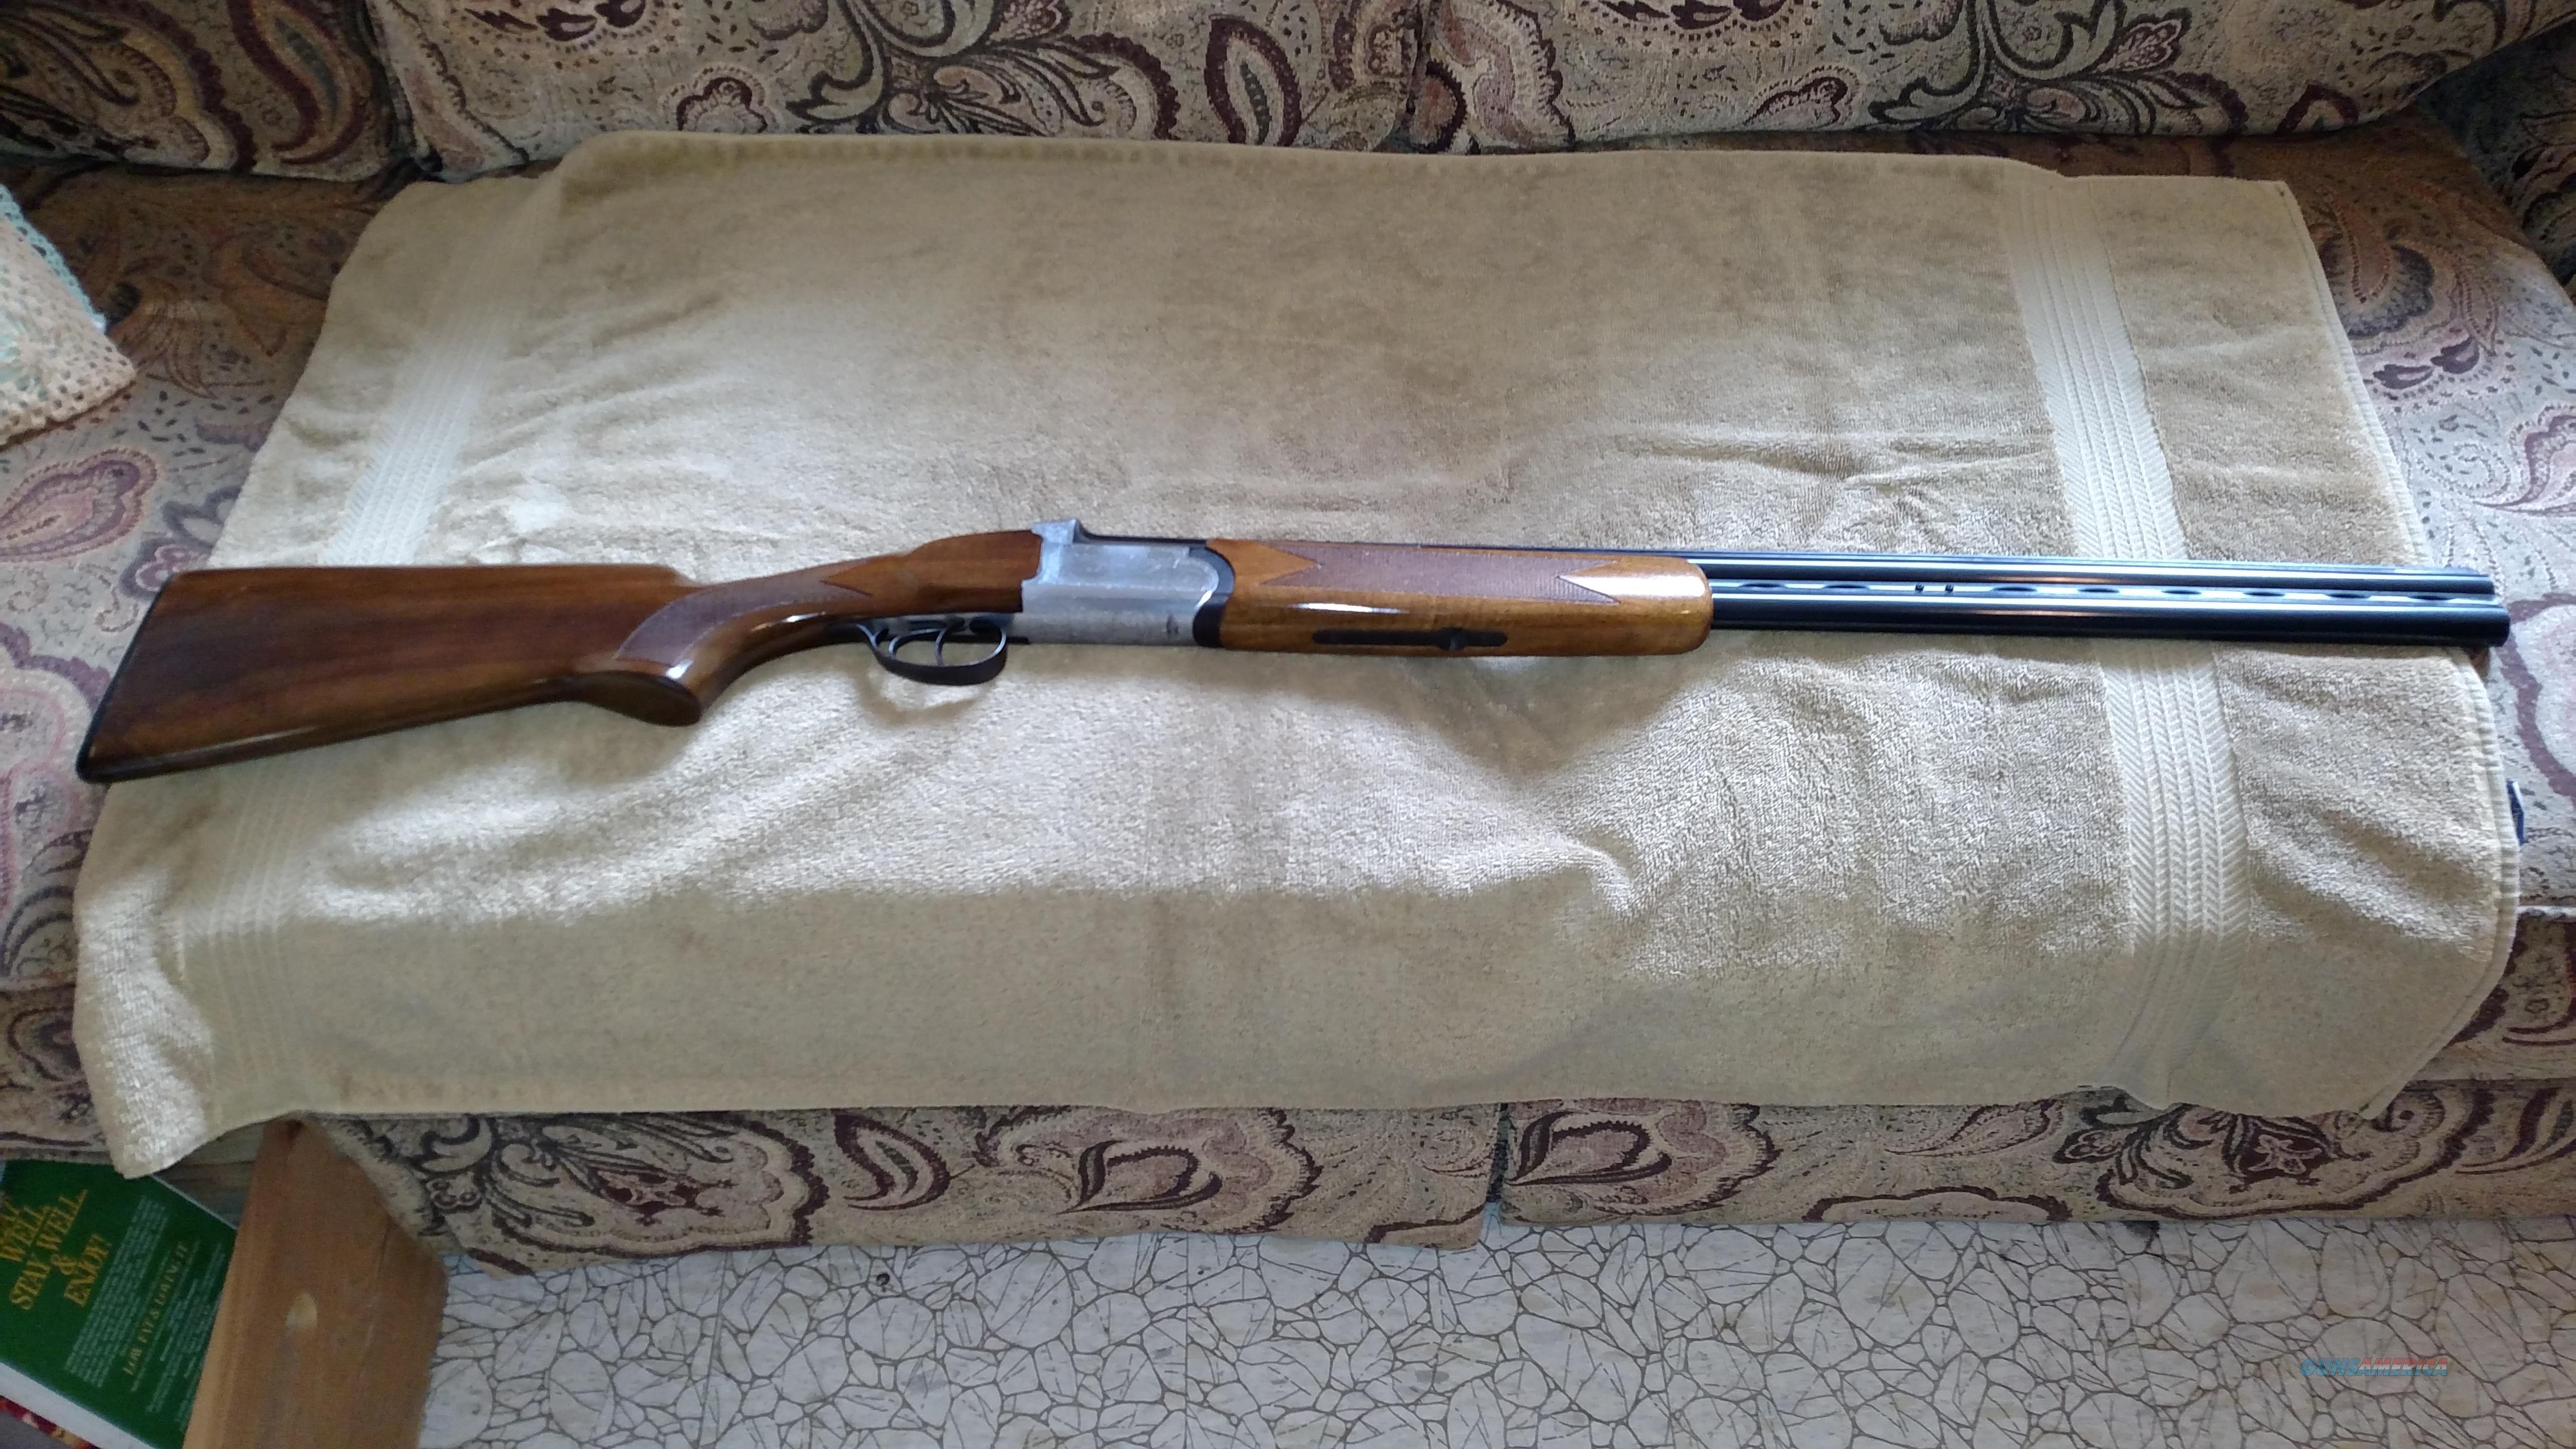 Maroccini (Italy) 12-gauge Over/Under Shotgun for sale